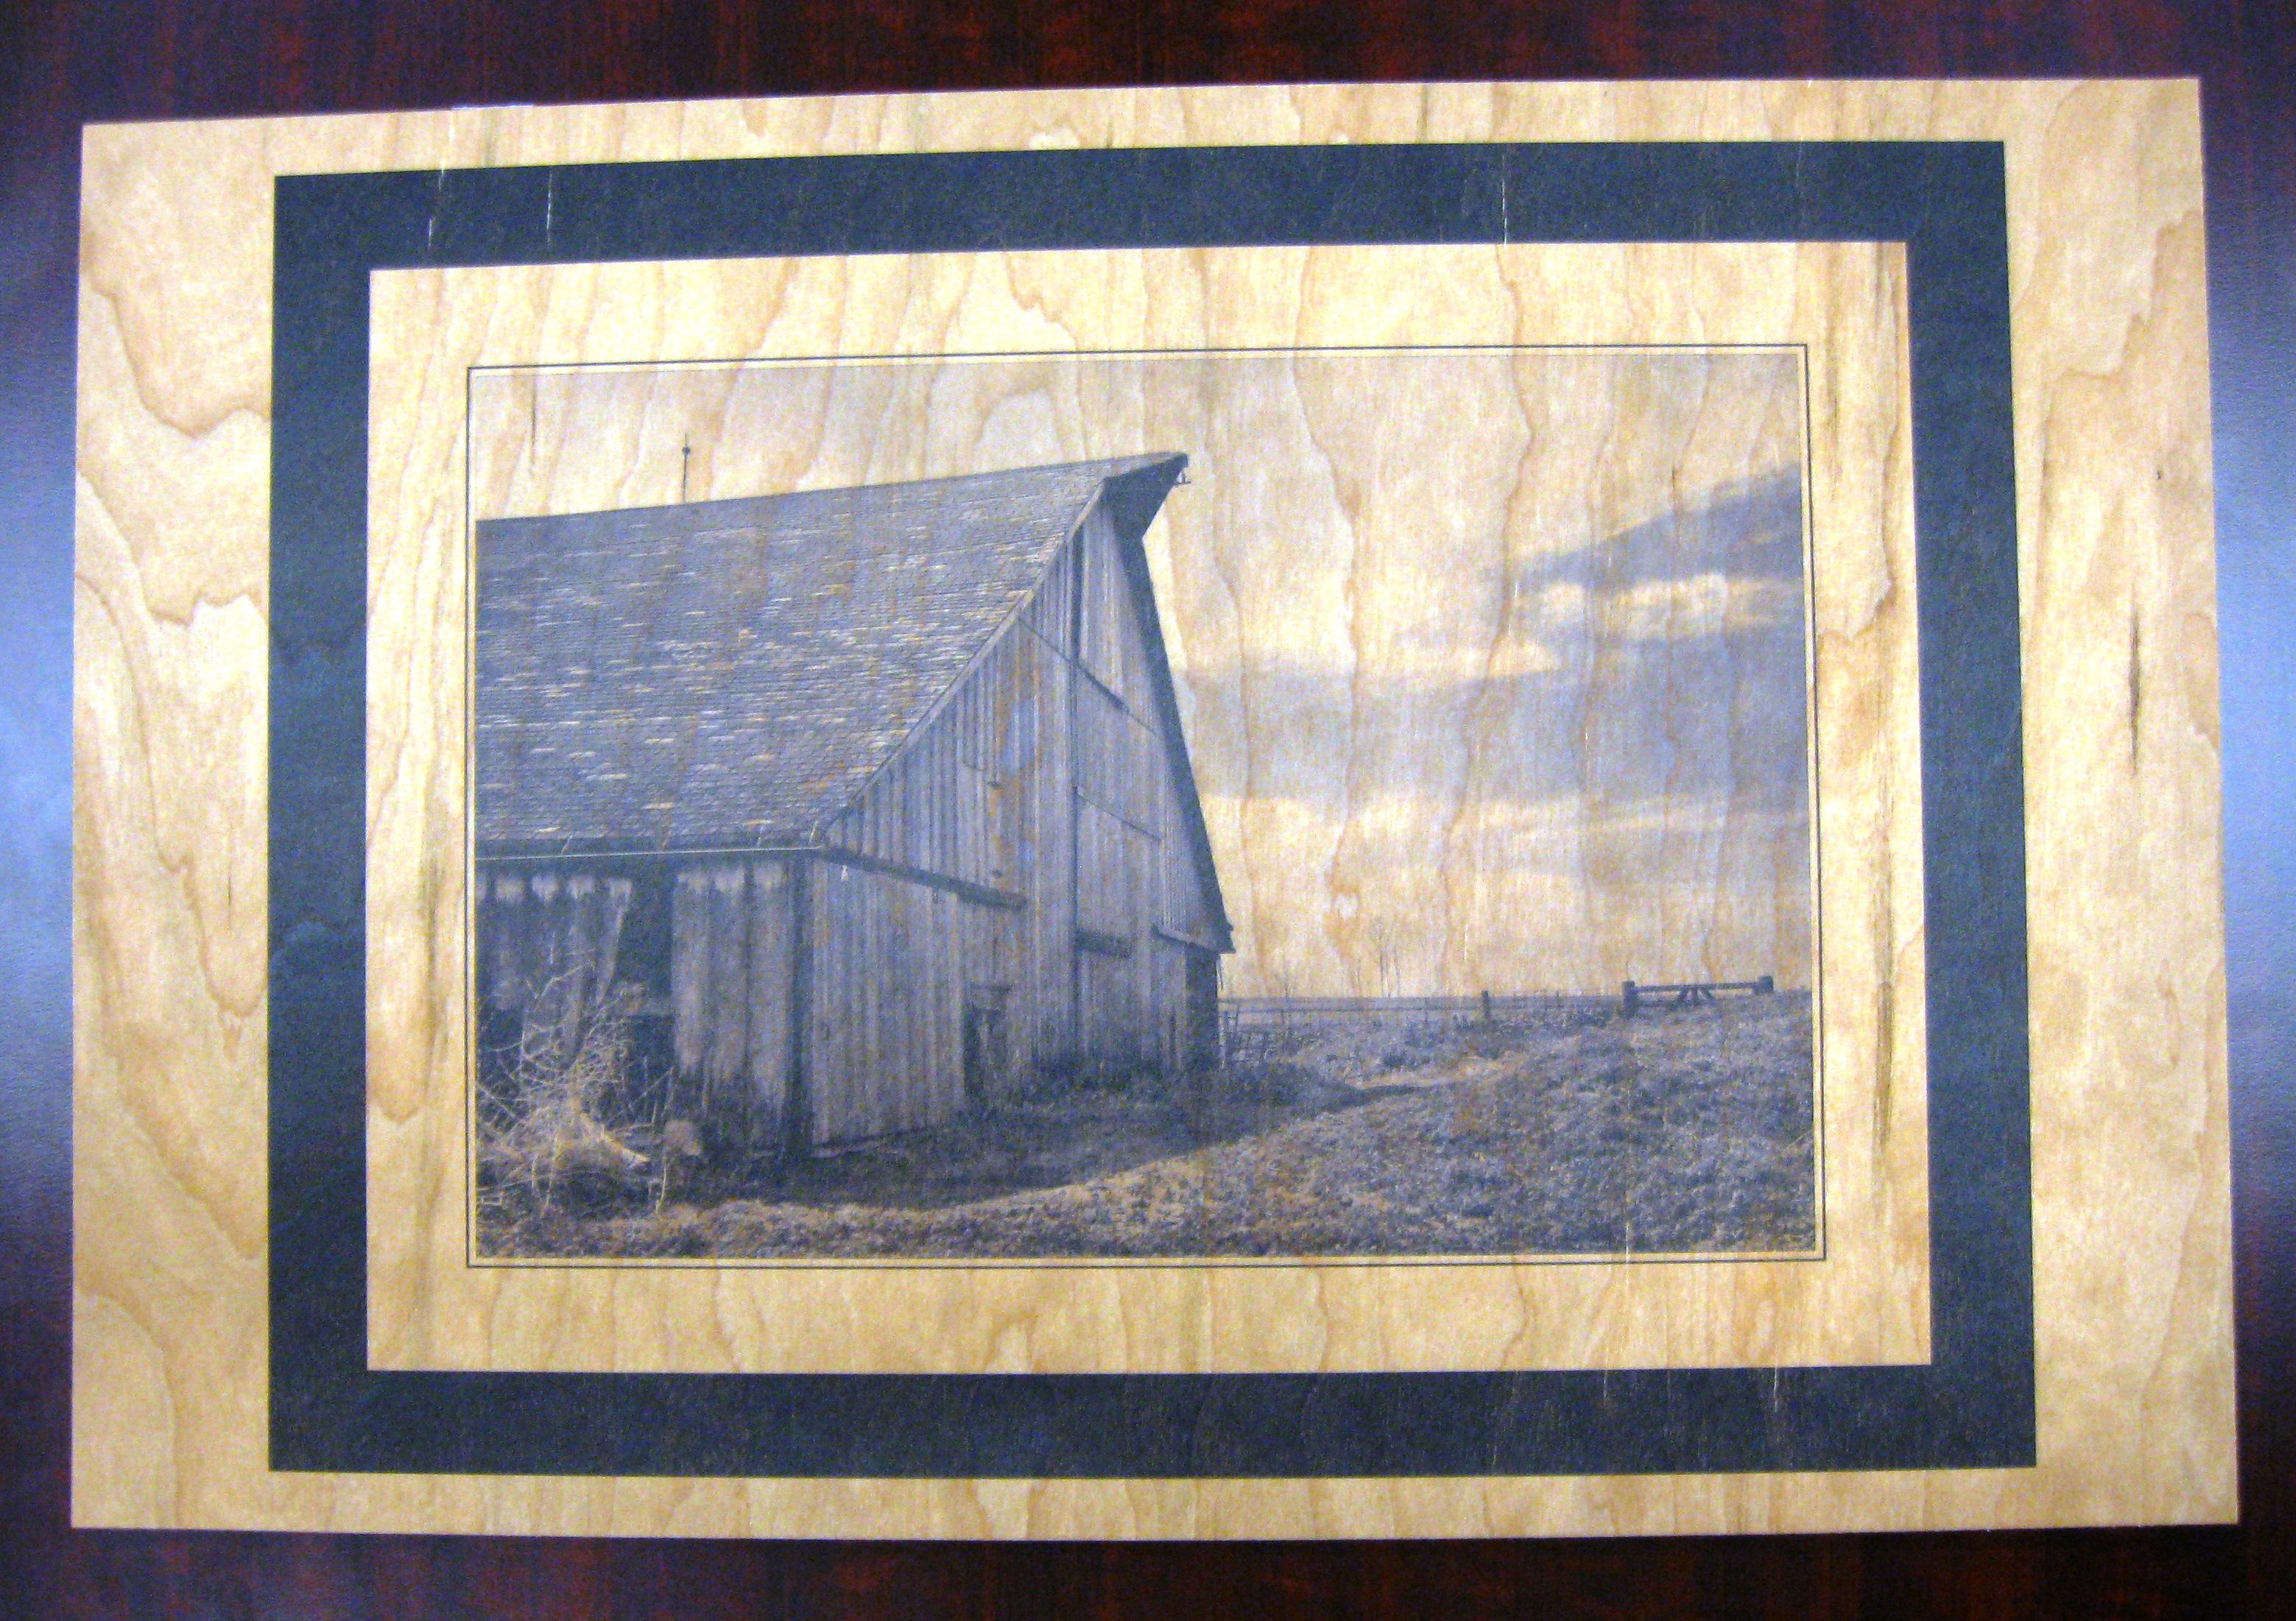 Barn on wood